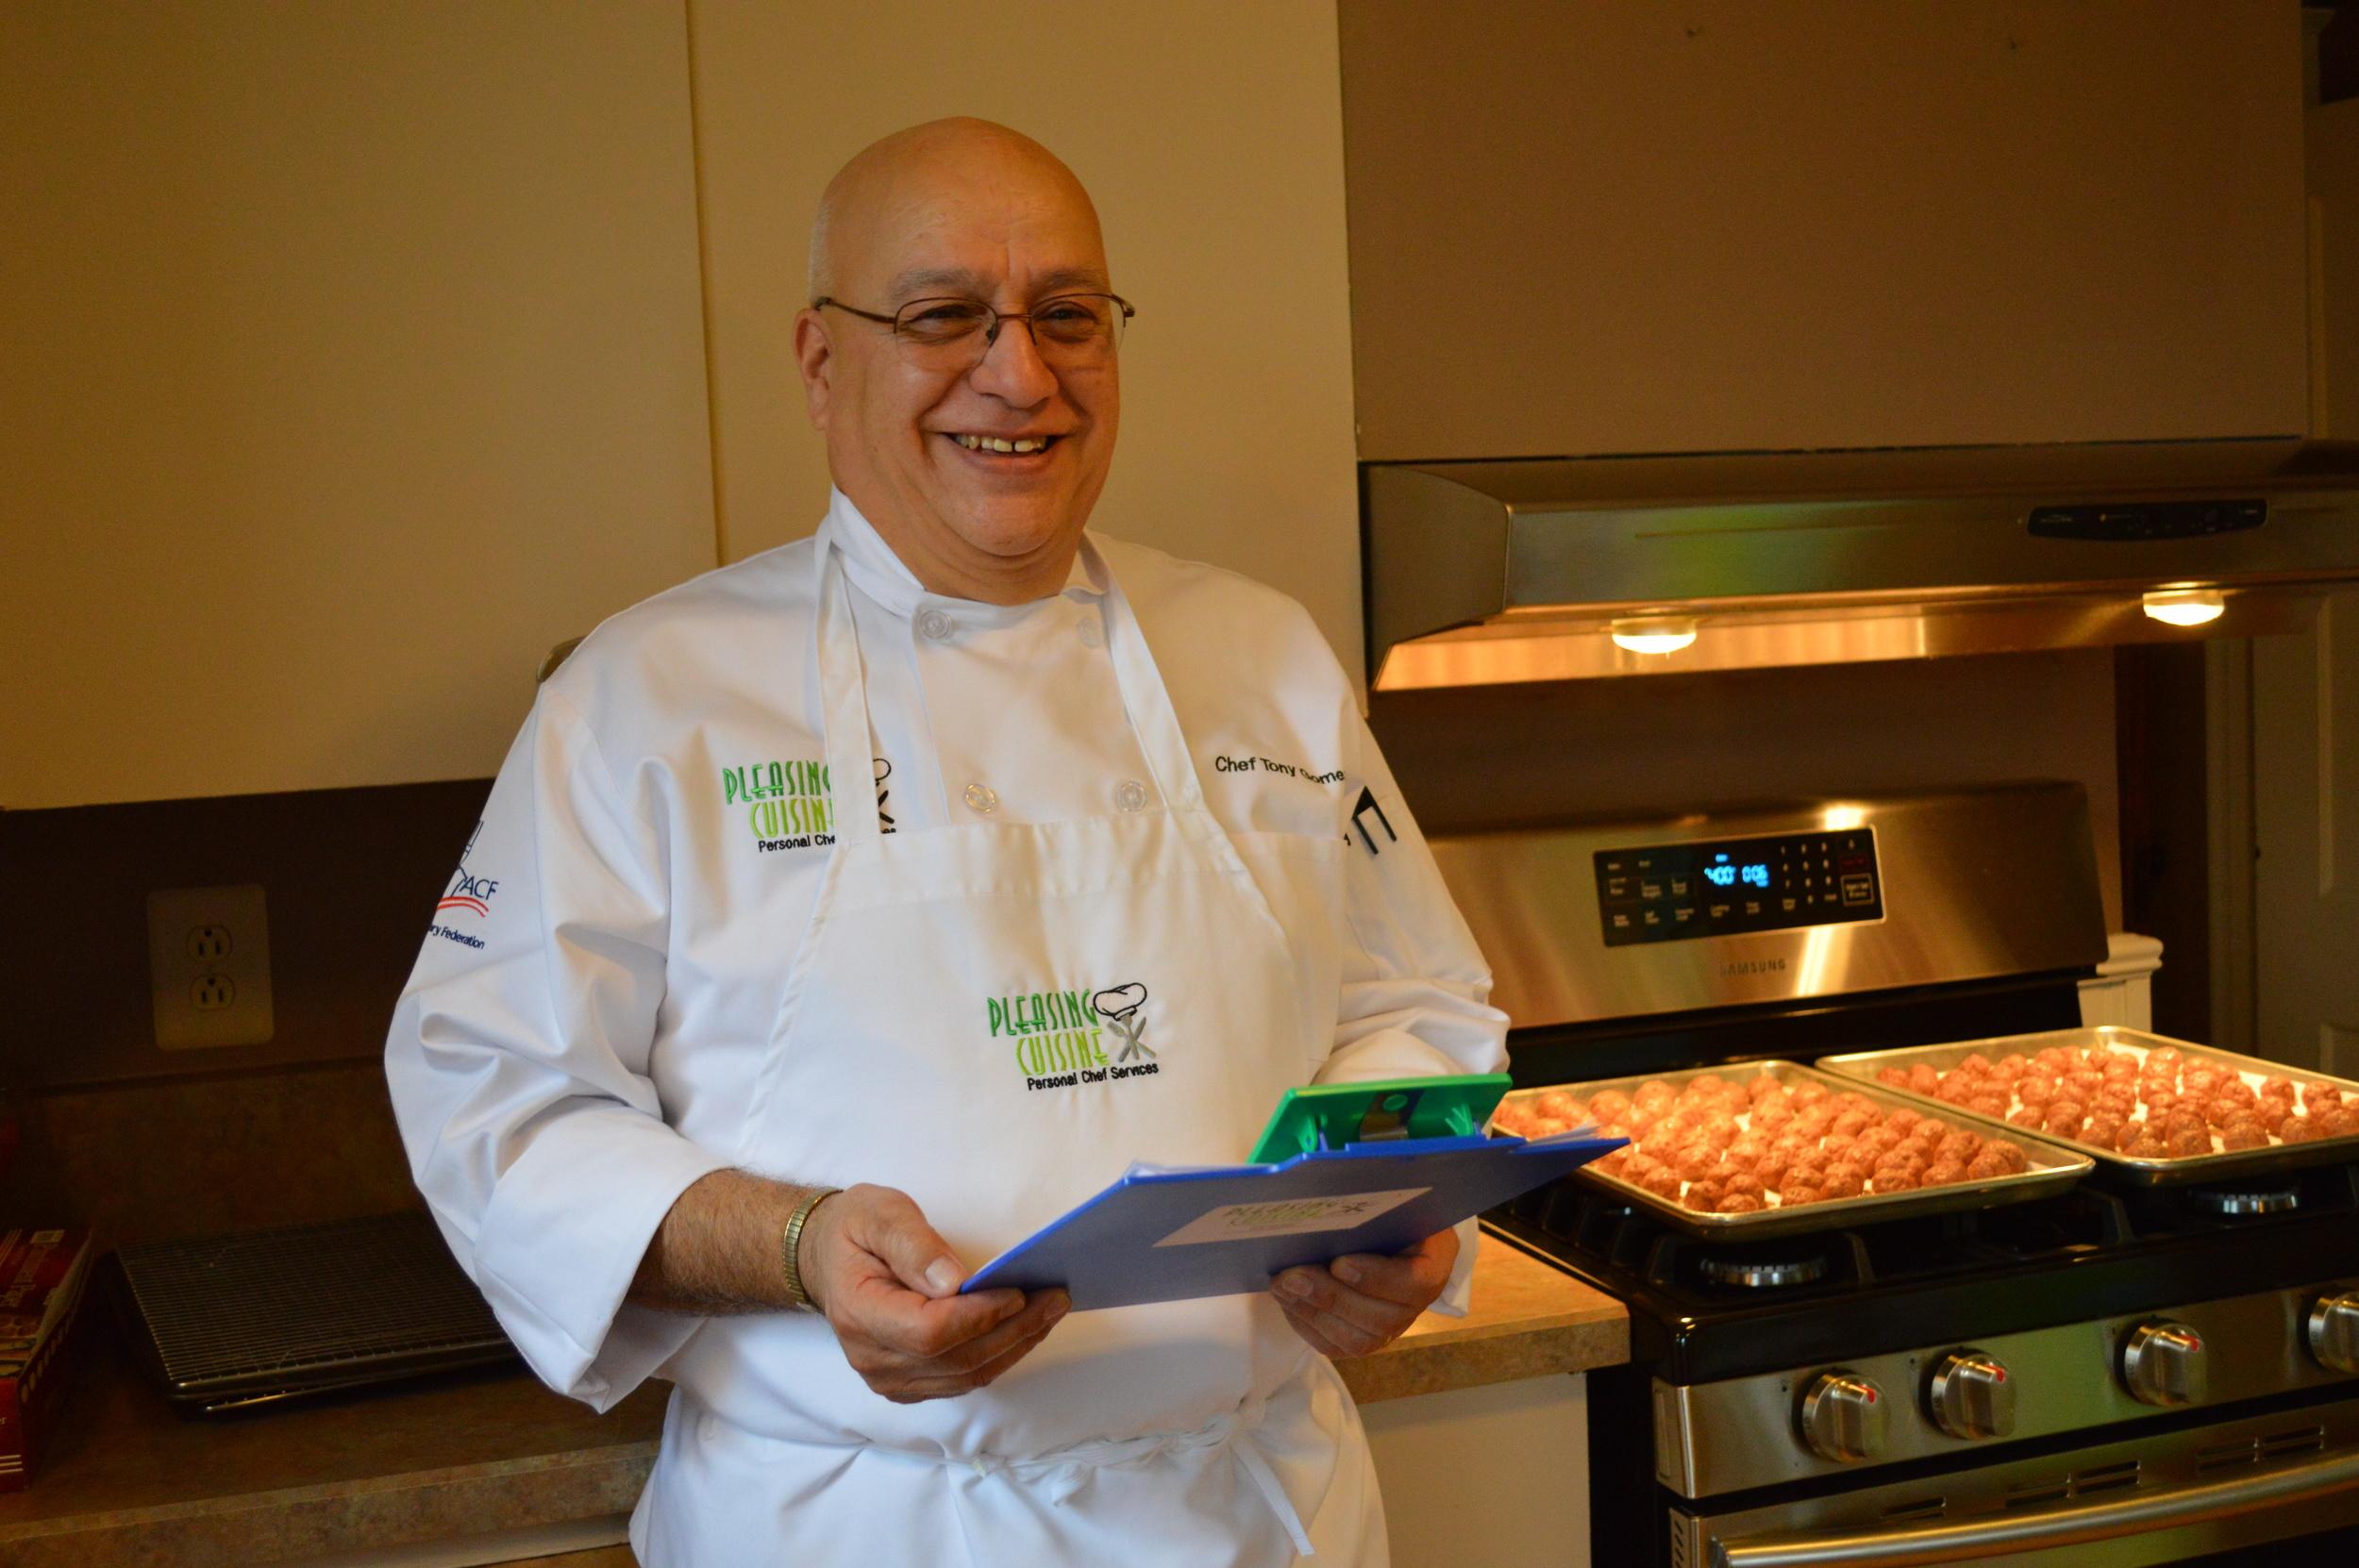 Chef Tony Gomez from Pleasing Cuisine